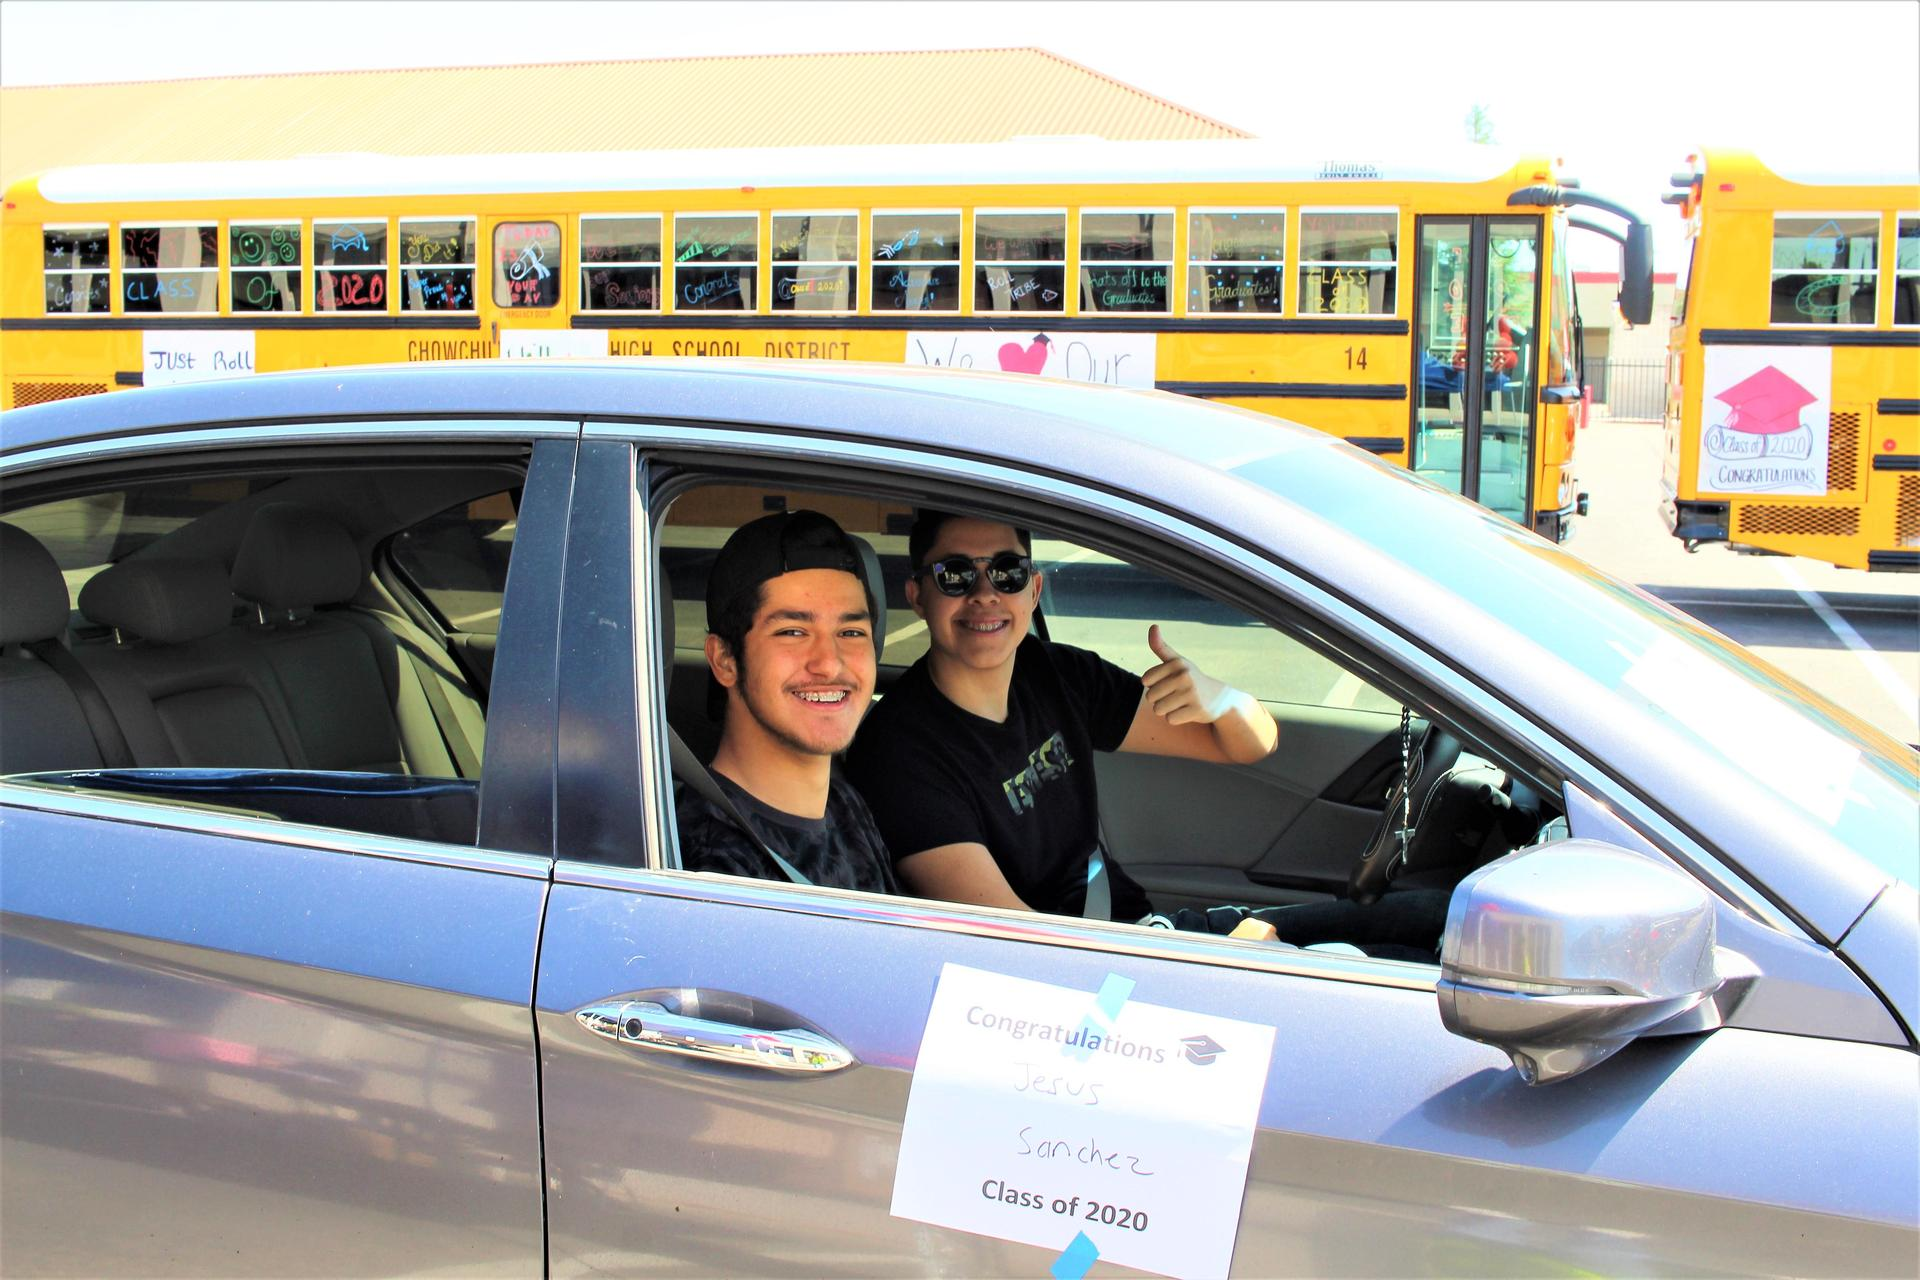 Jesus Sanchez riding with Emmanuel Garcia driving through